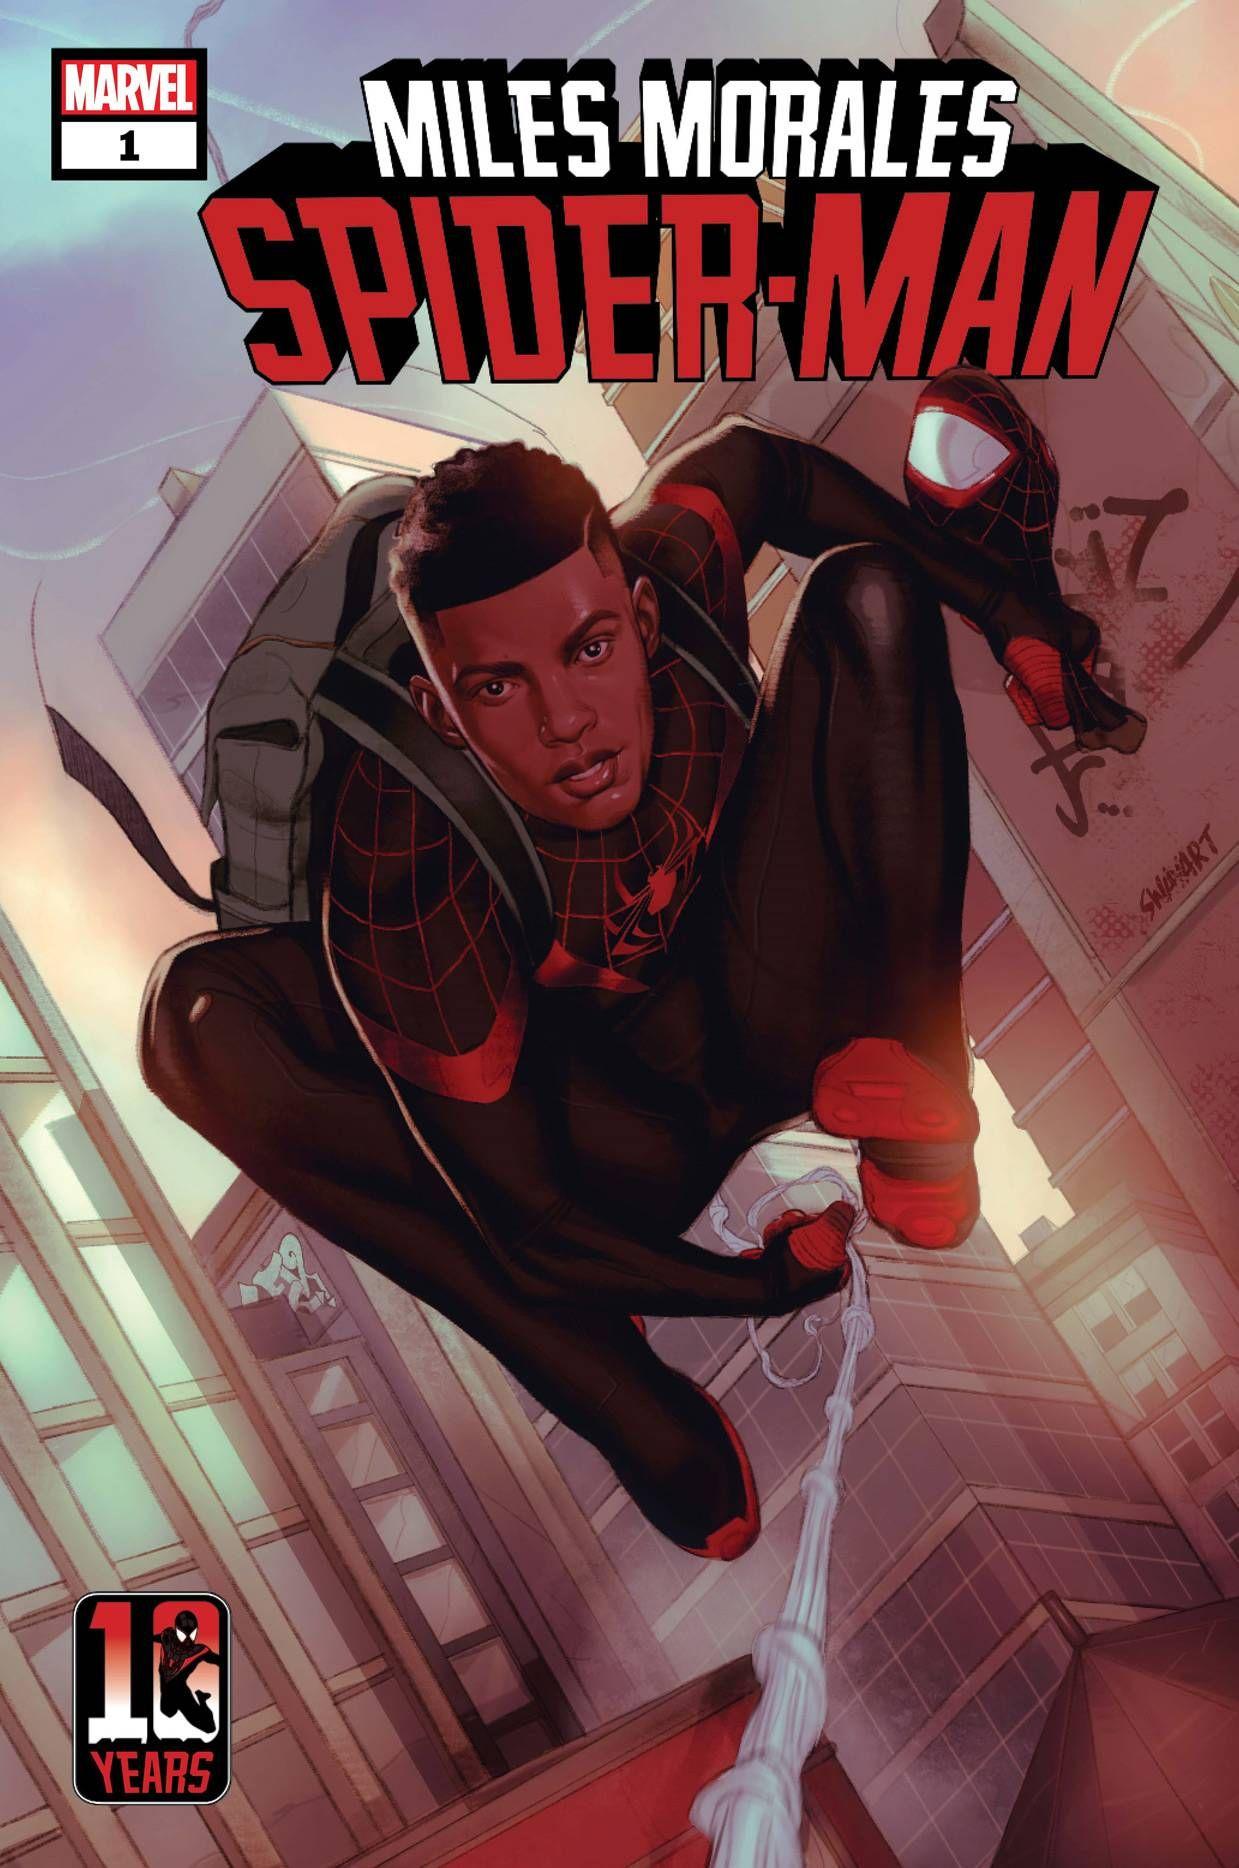 eyJidWNrZXQiOiJnb2NvbGxlY3QuaW1hZ2VzLnB1YiIsImtleSI6ImRmNjZmYWJhLTA2M2ItNGJjYS1hMDVhLWJhOTE3ZDkxNzE2MS5qcGciLCJlZGl0cyI6W119 ComicList: Marvel Comics New Releases for 08/04/2021